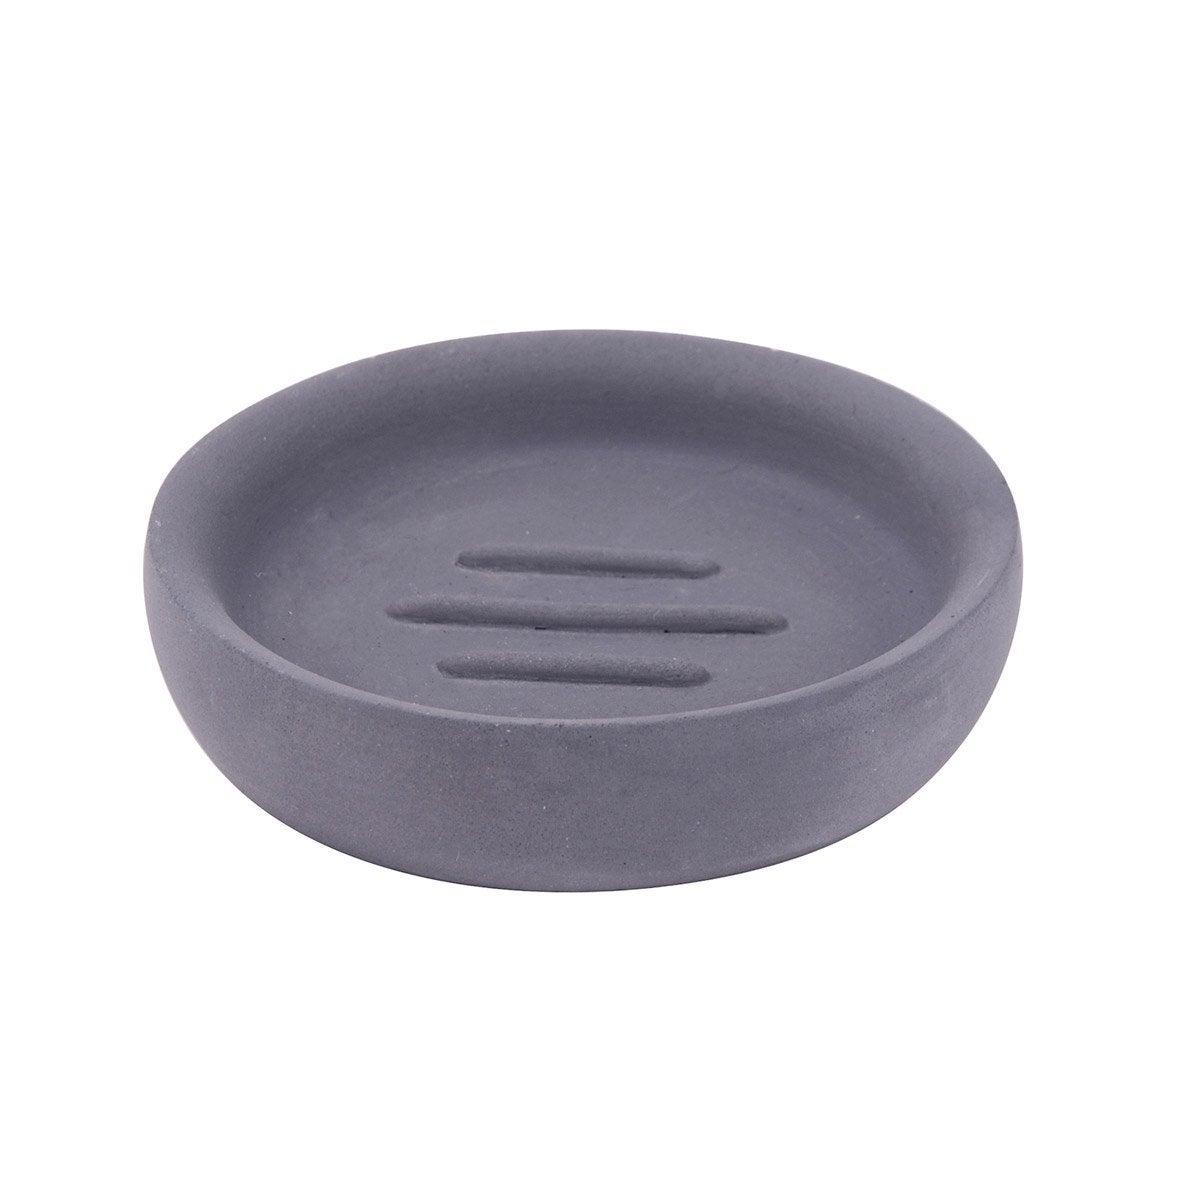 Porte-savon béton Apollon, gris foncé